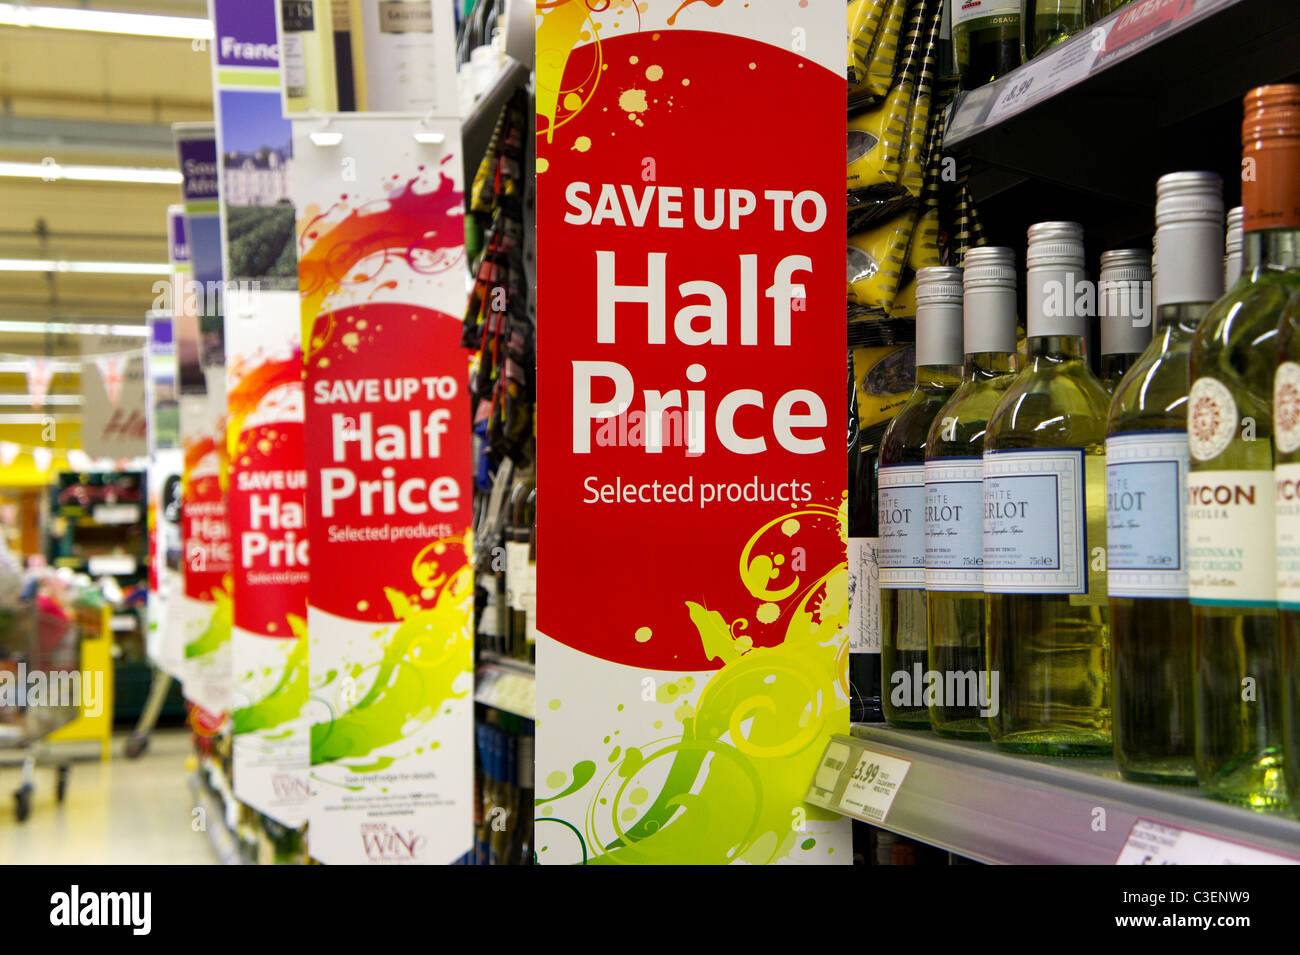 Half price wine offer in a UK supermarket - Stock Image